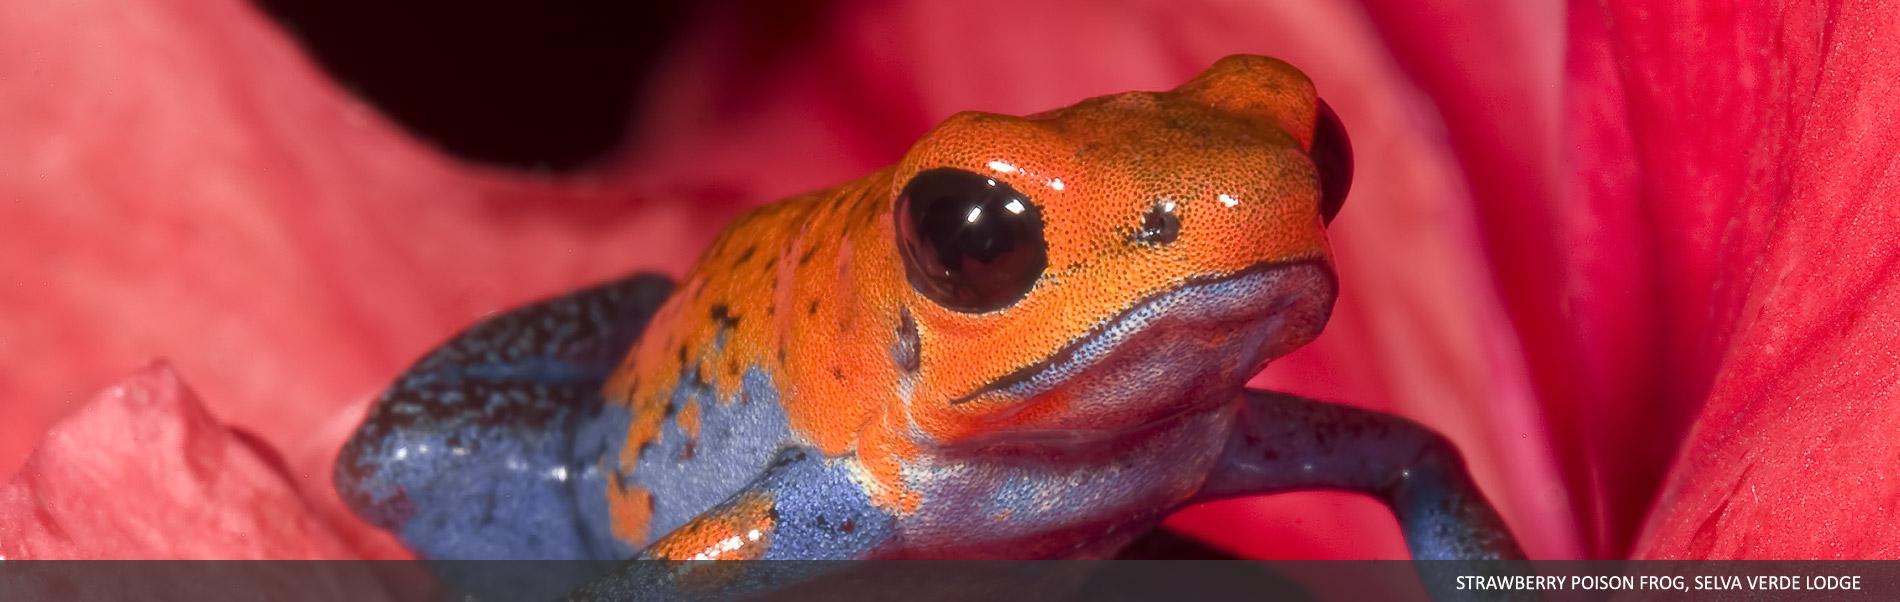 Amphibians-Reptiles-00.jpg